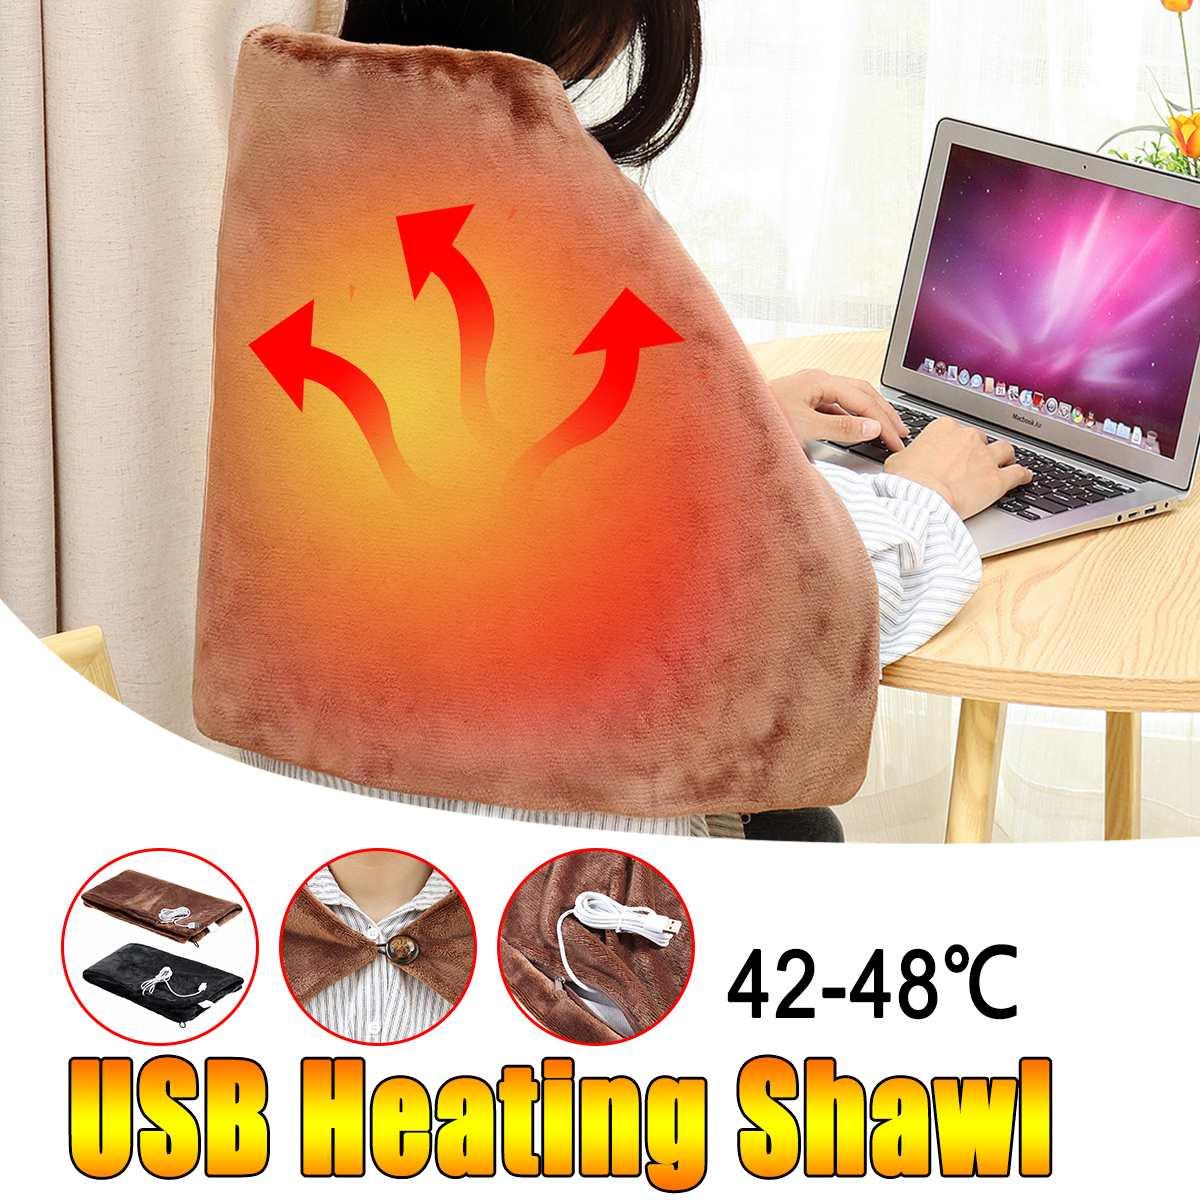 45x80CM 5V 4W Warm Care Car Home Electric Warming Heating Blanket Pad Shoulder Neck Mobile-Heating Shawl USB Advance Soft Plush